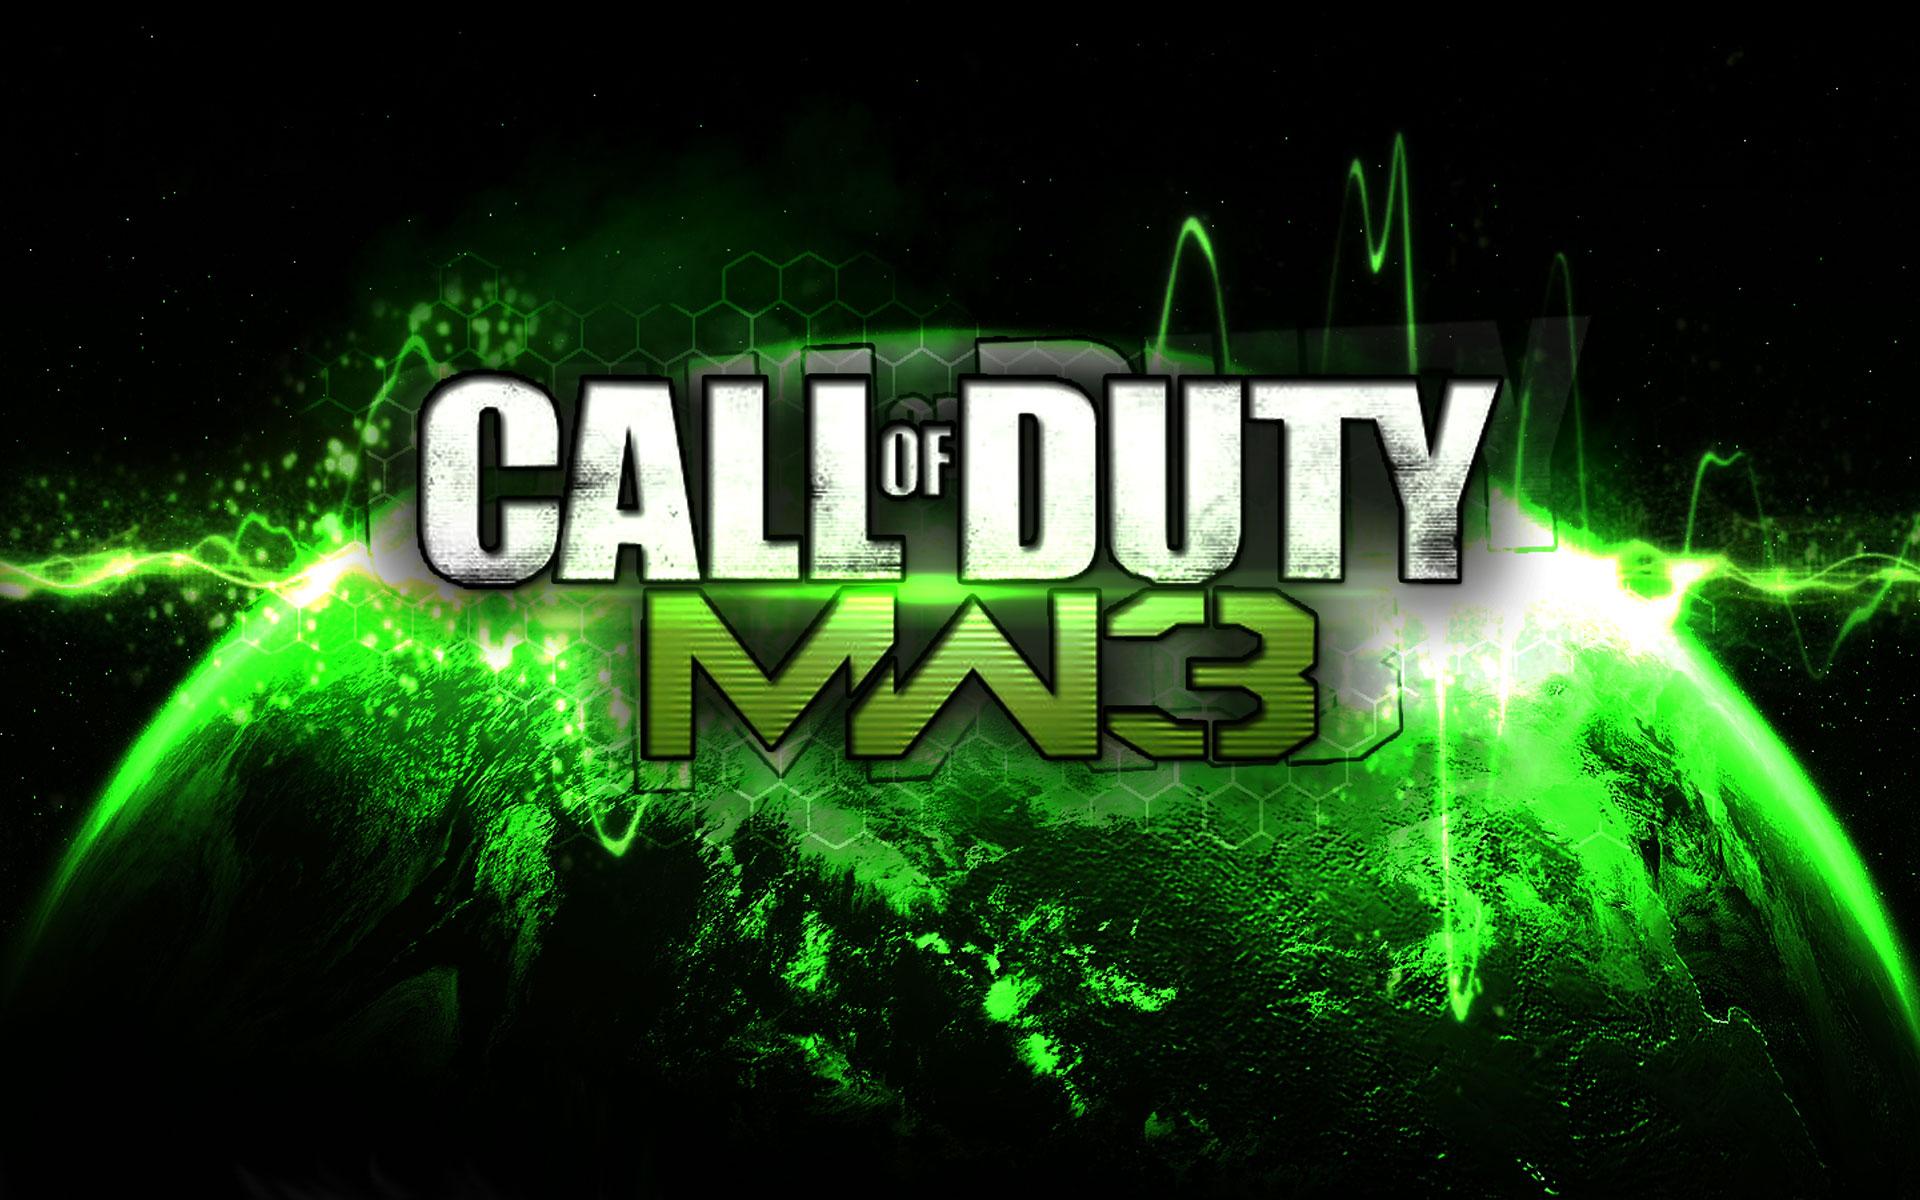 Call Of Duty Modern Warfare 3 Wallpaper Logo Splash